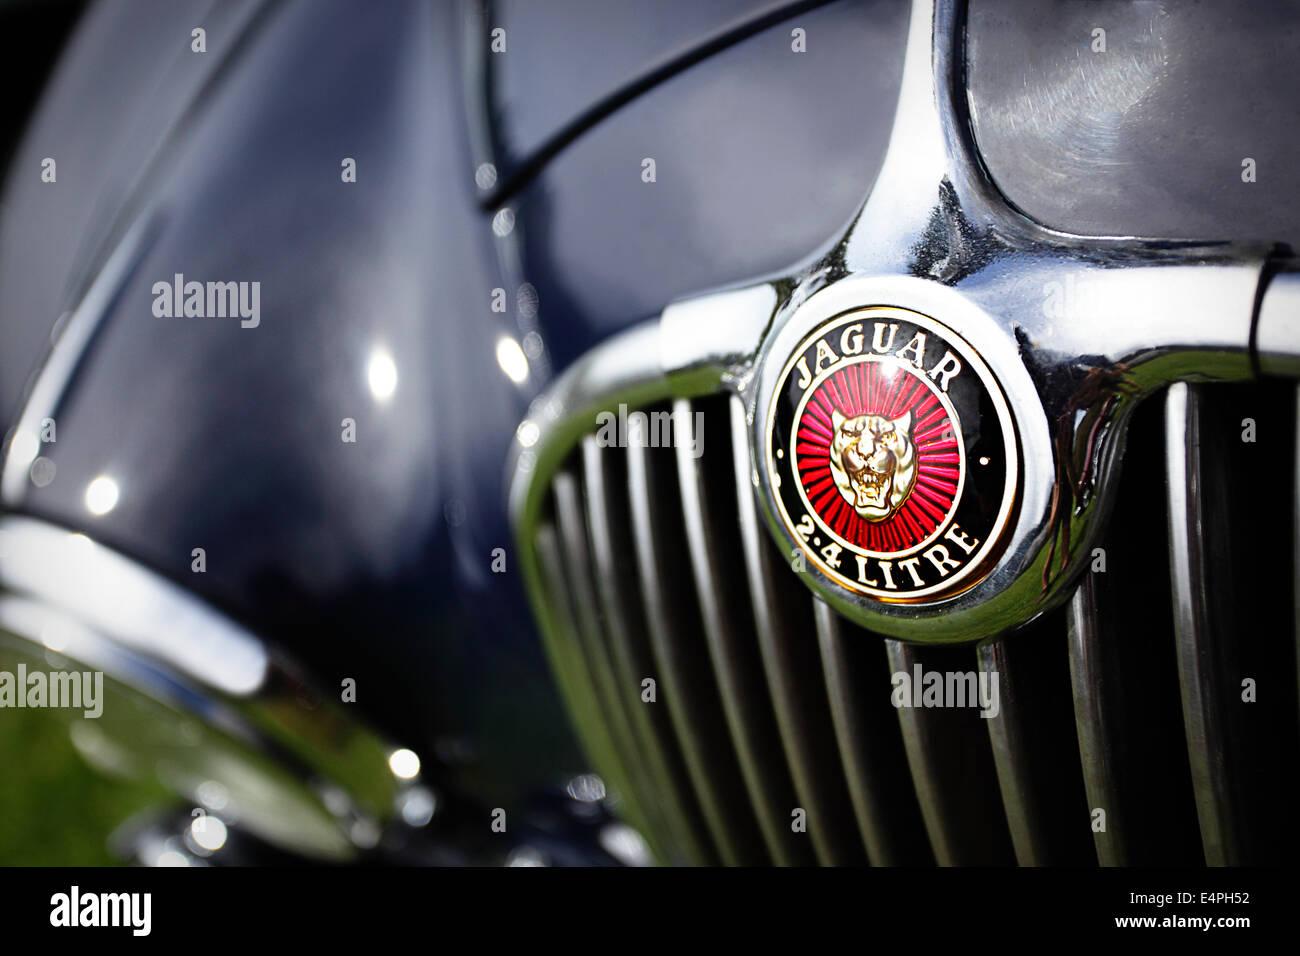 Emblem on navy blue Jaguar Mark 1 saloon car - Stock Image